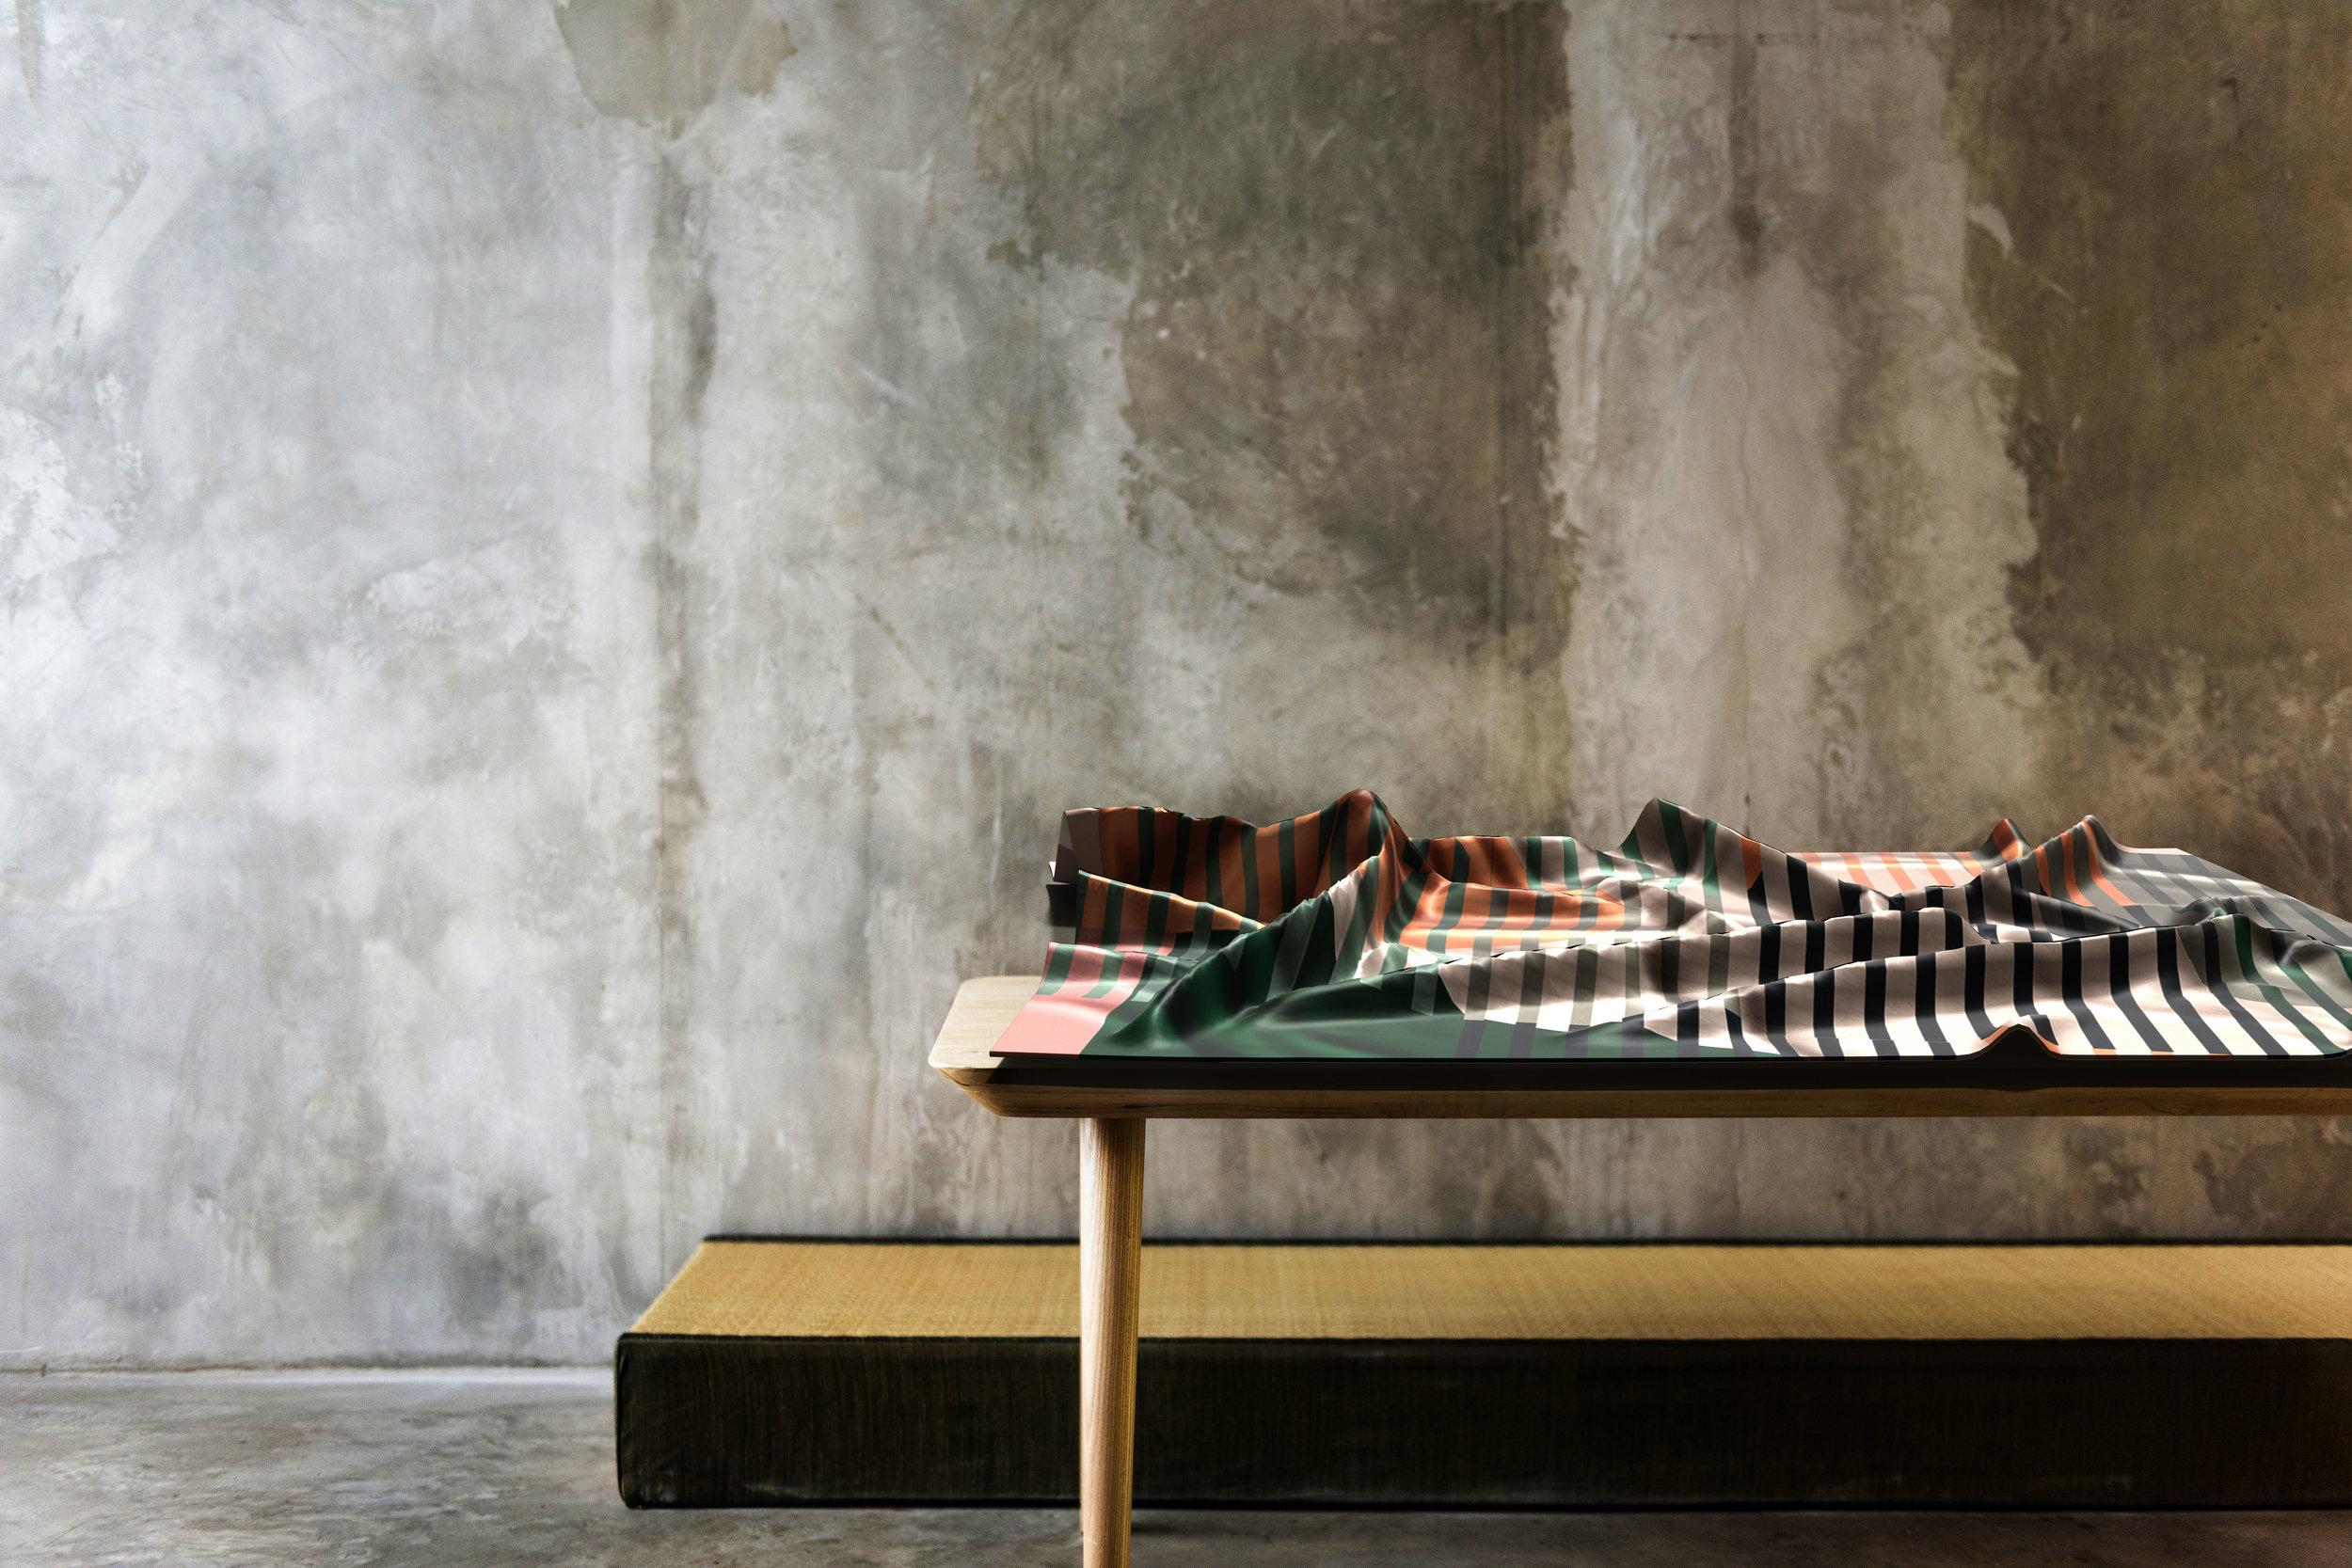 tablecloth stripes.jpg